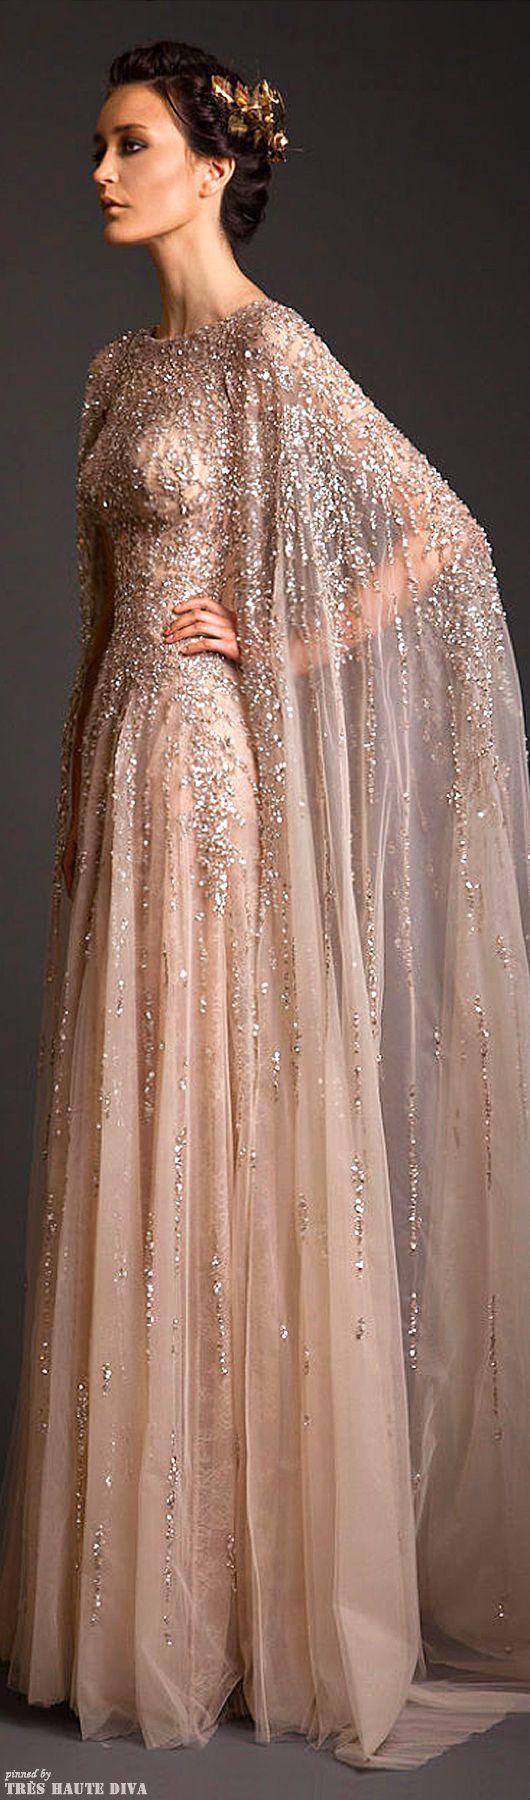 krikor jabotian2 - Vestidos de Noiva Coloridos - Inspirações